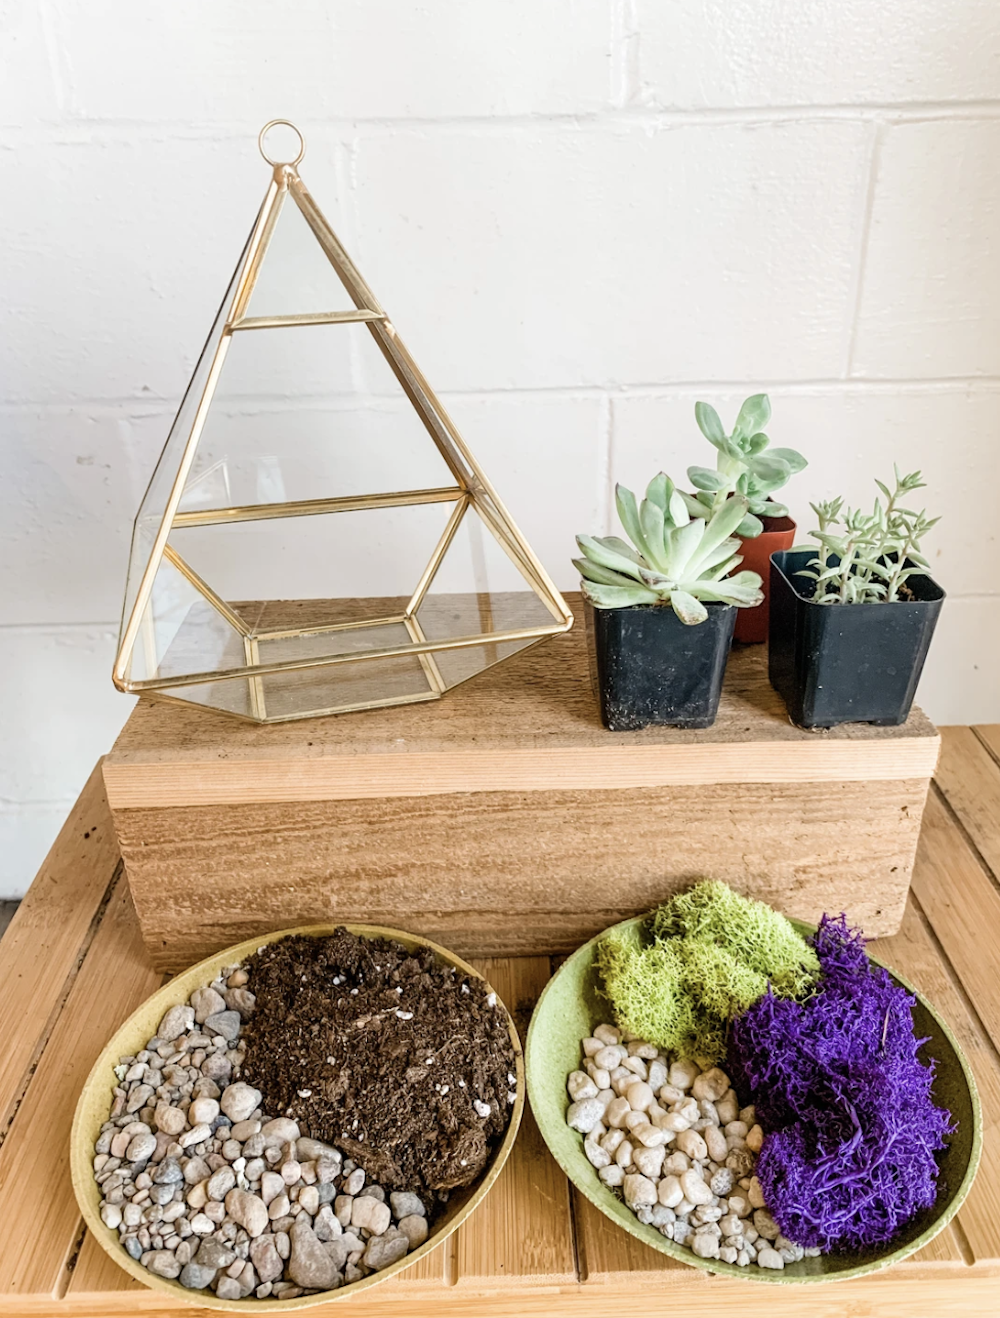 Terrarium kit with plants, materials and container from Art Terrarium